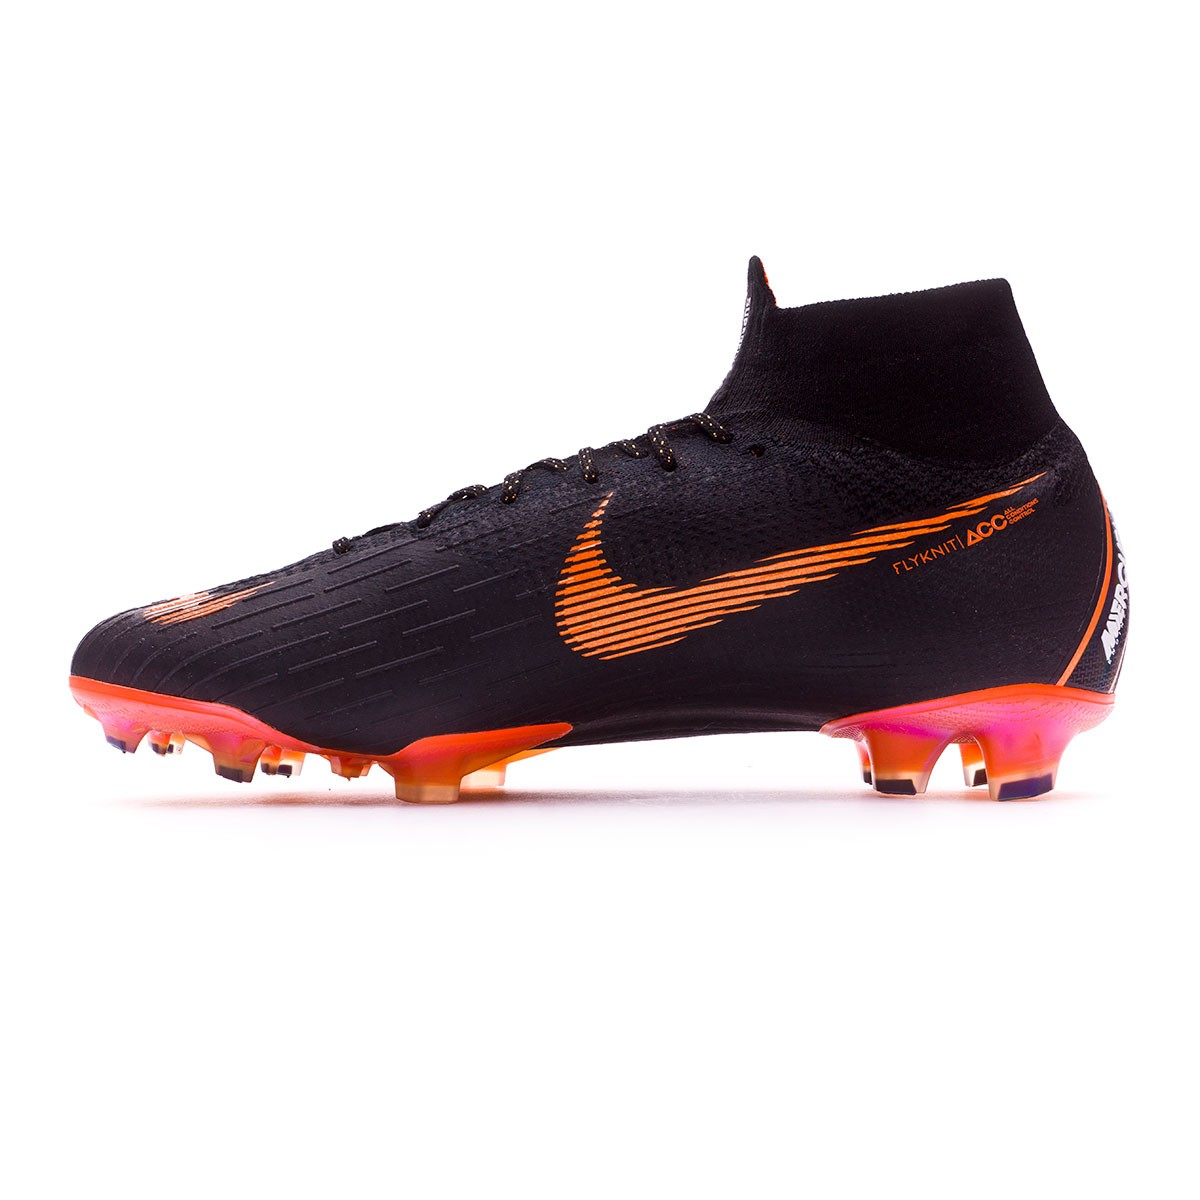 e17a14612 Football Boots Nike Mercurial Superfly VI Elite FG Black-Total orange-White  - Football store Fútbol Emotion